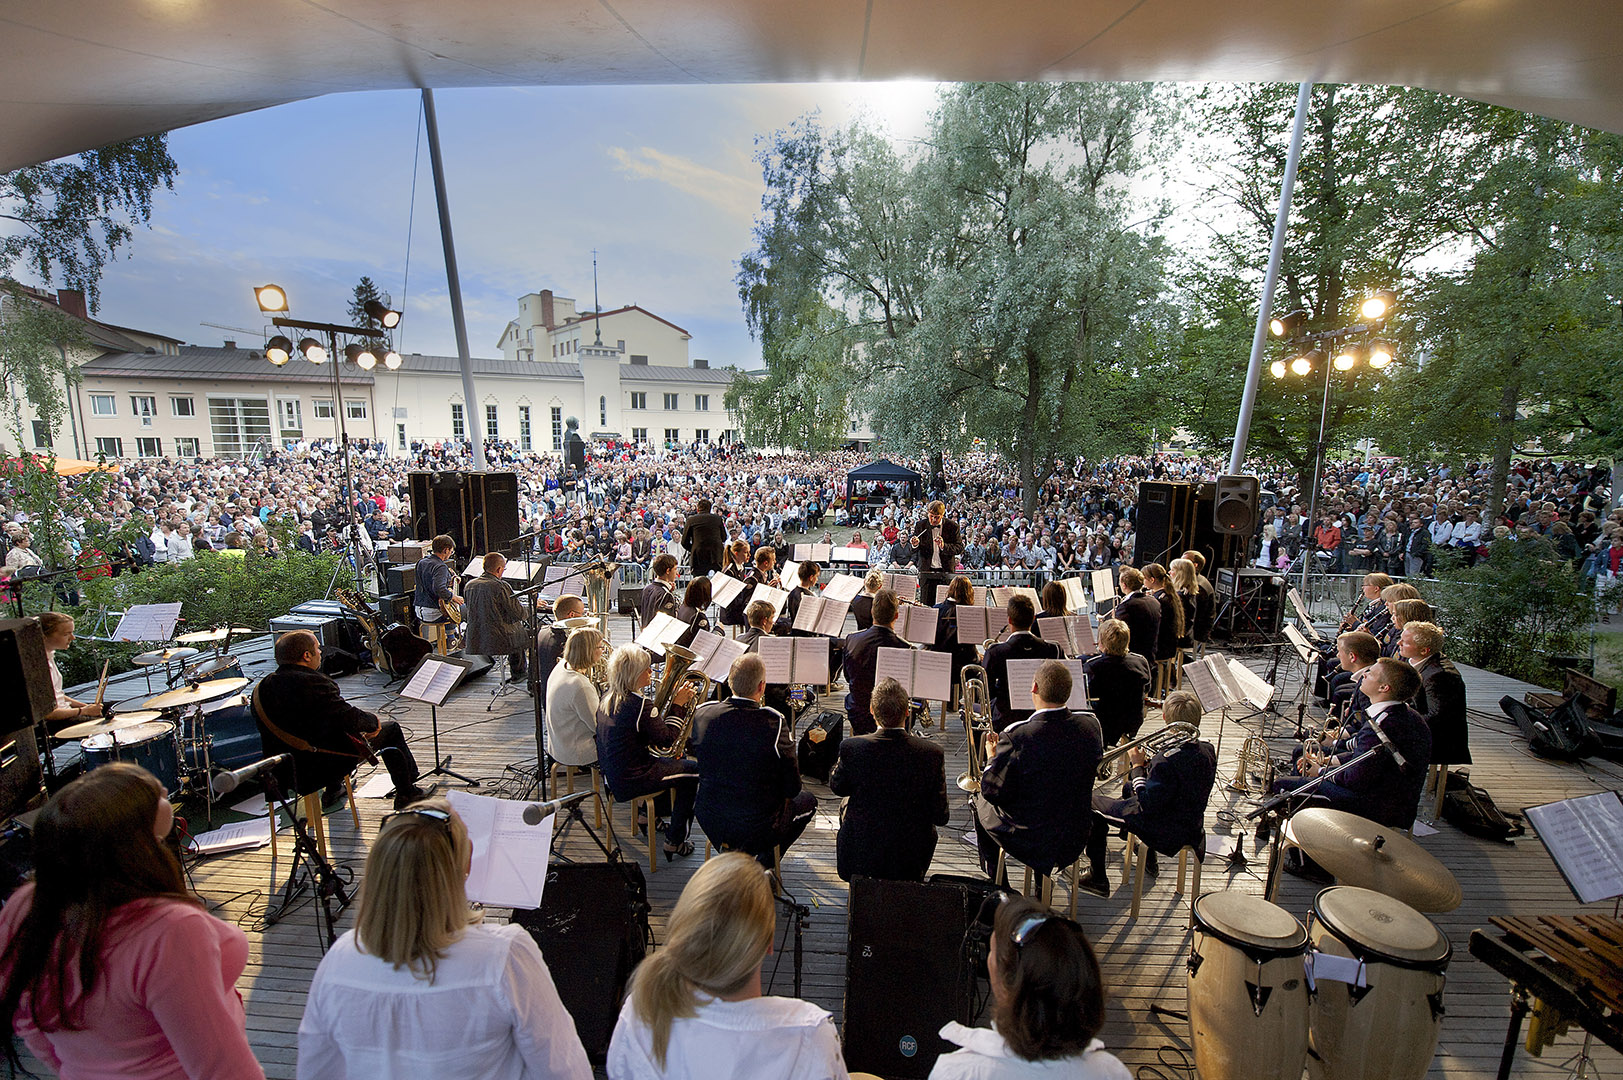 2_Visit Pietarsaari Seutu_2_Concert in the park_Image credit_ Nicklas Storbjörk